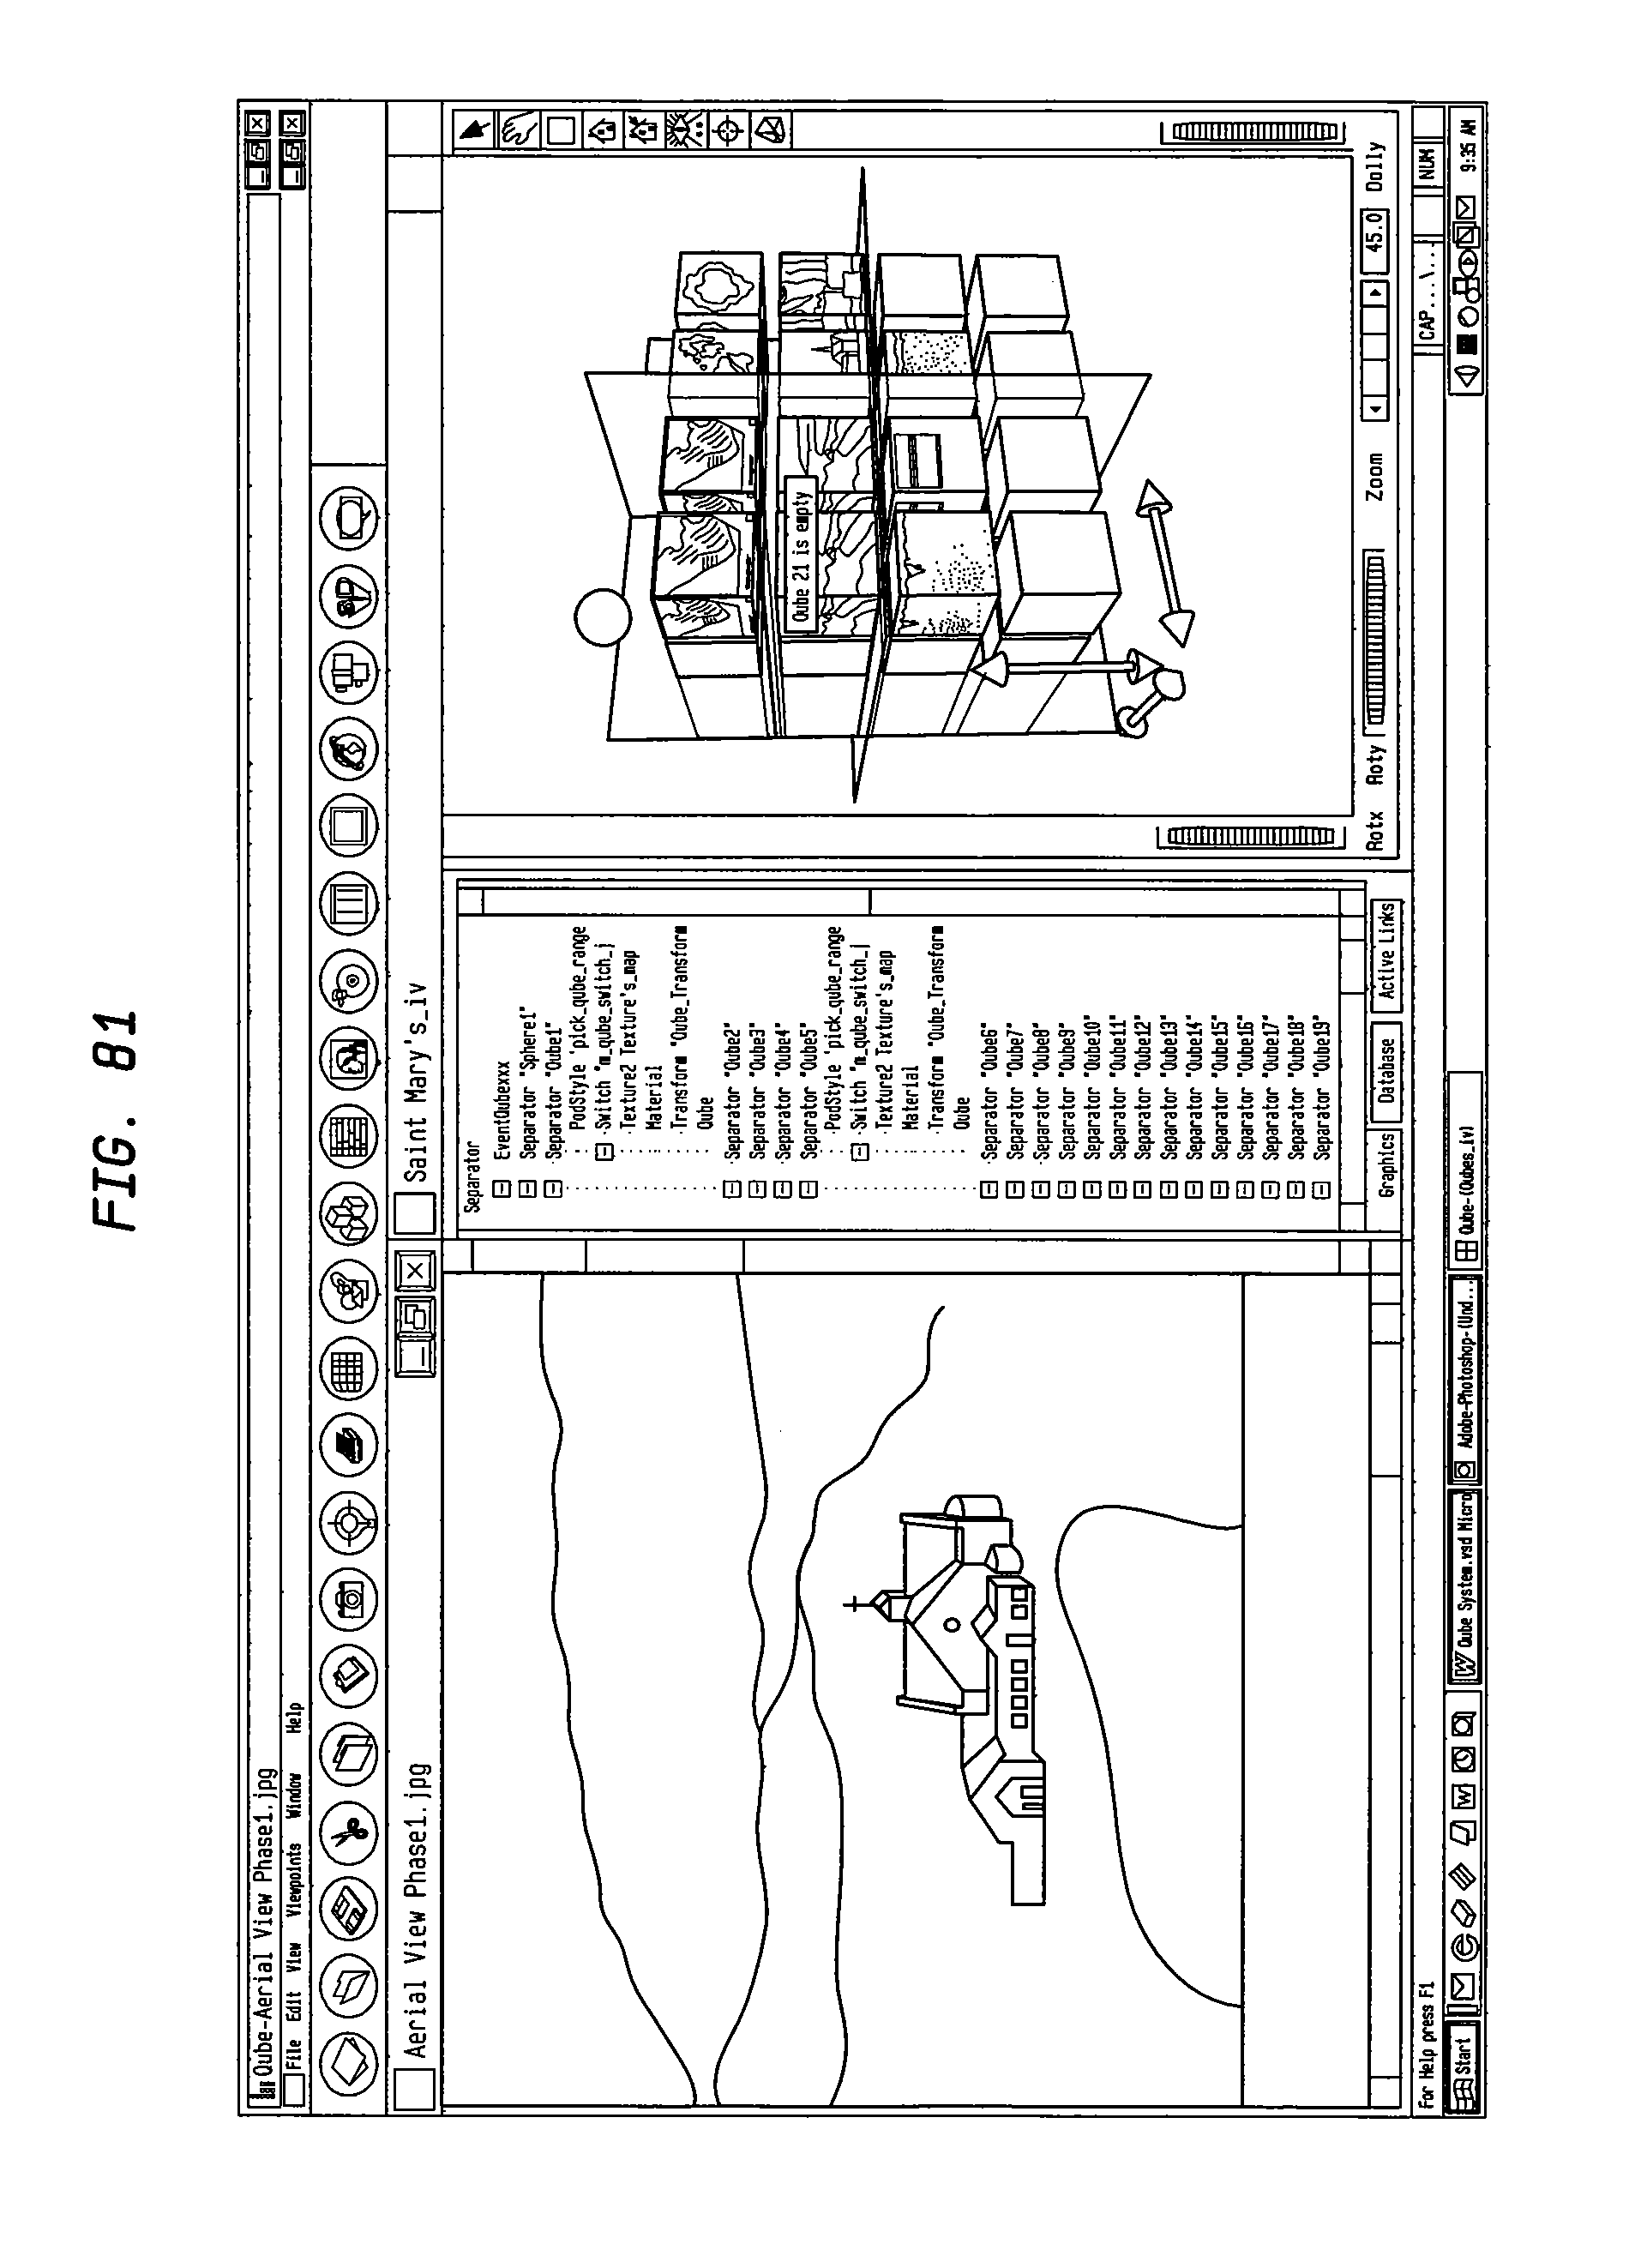 Patent US 7,433,885 B2